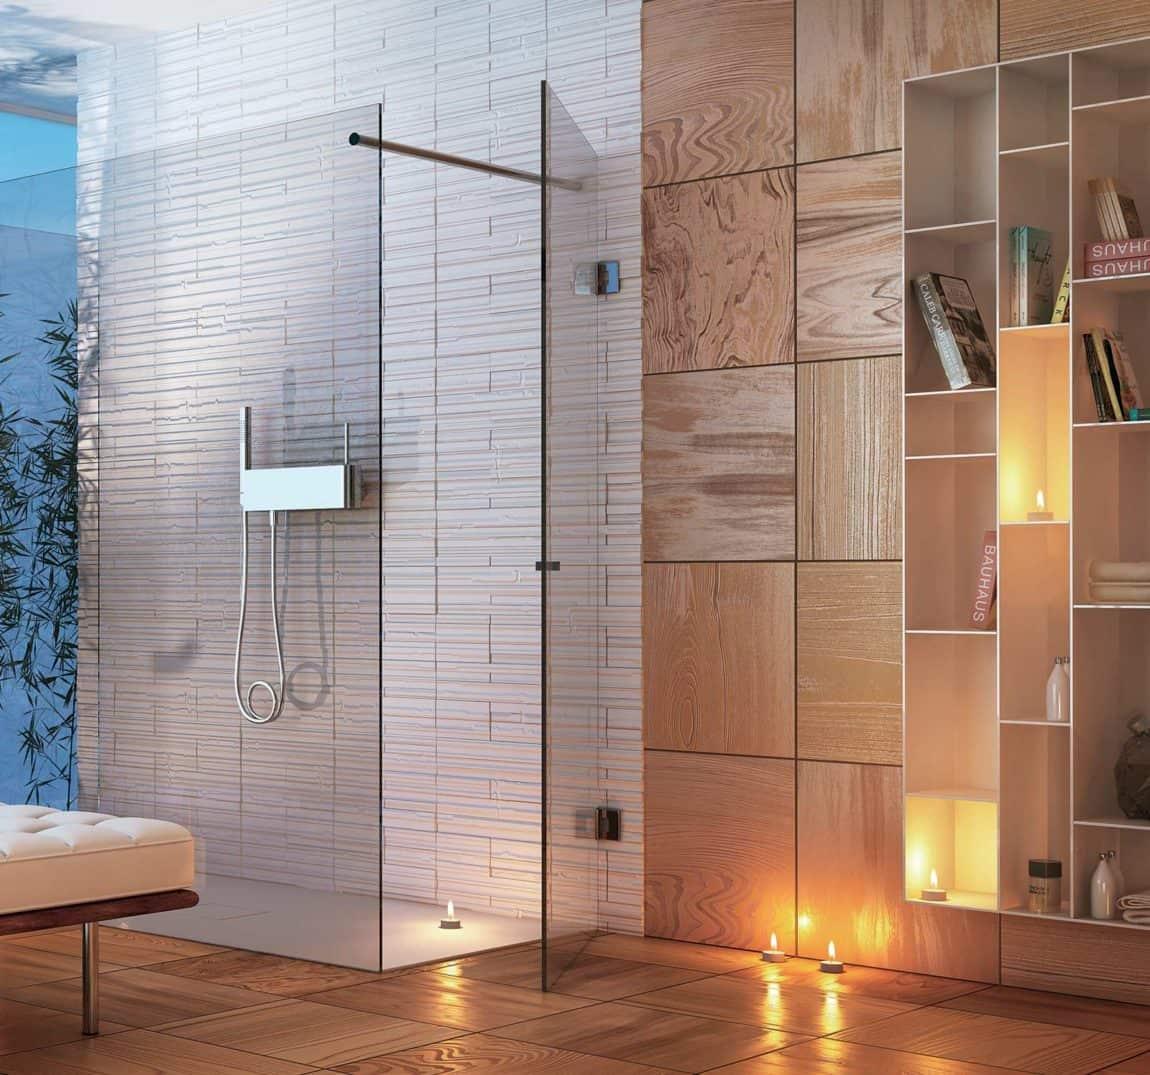 Modern Bathrooms by MOMA Design (34)